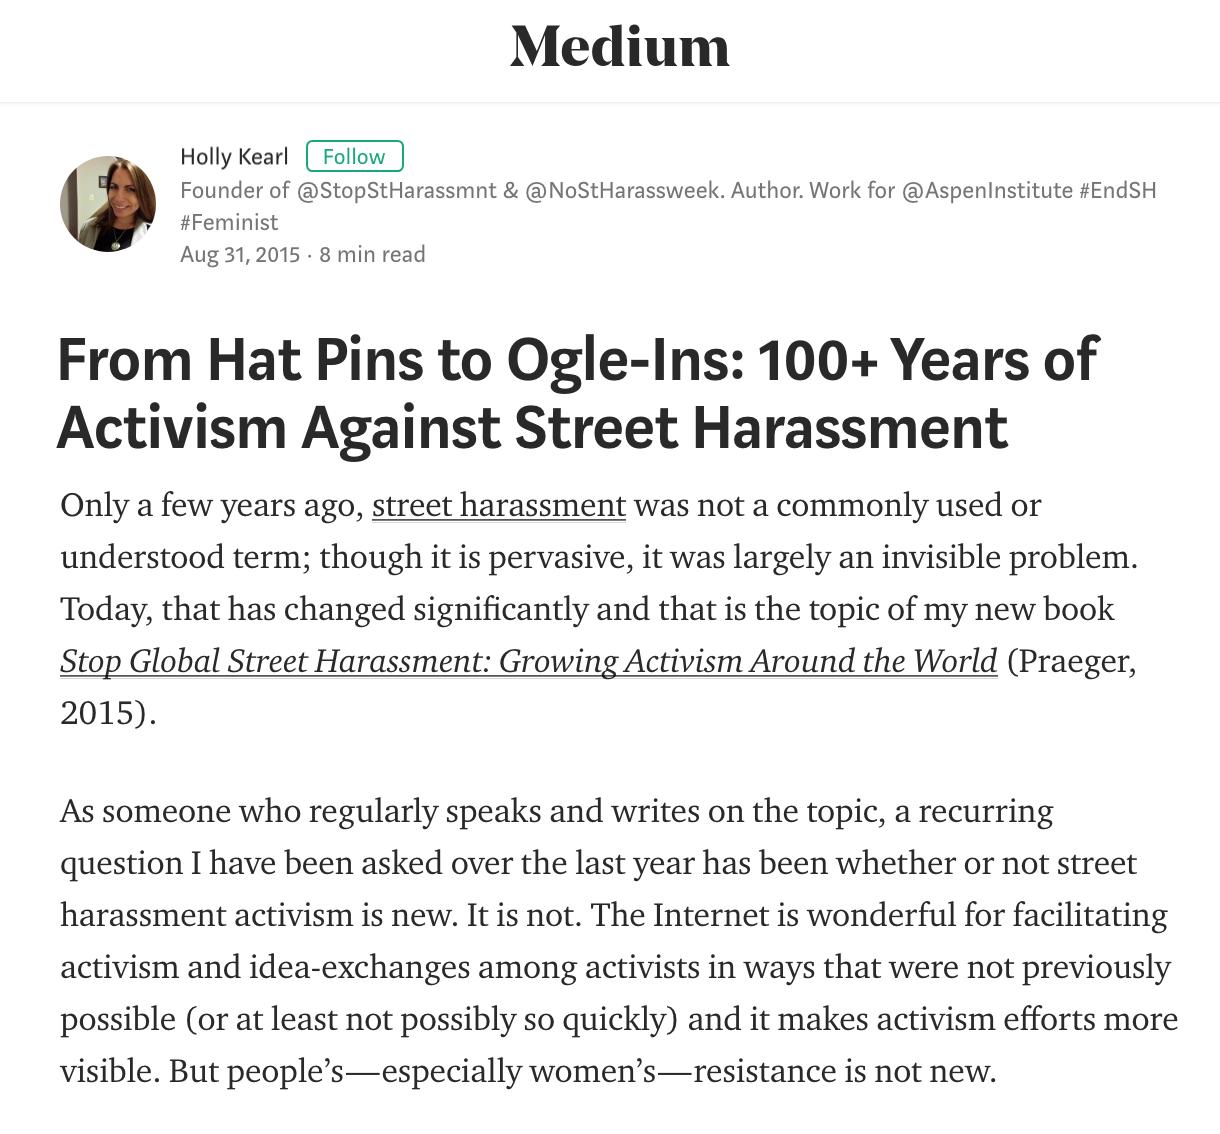 Medium Article by Holly Kearl, 2015